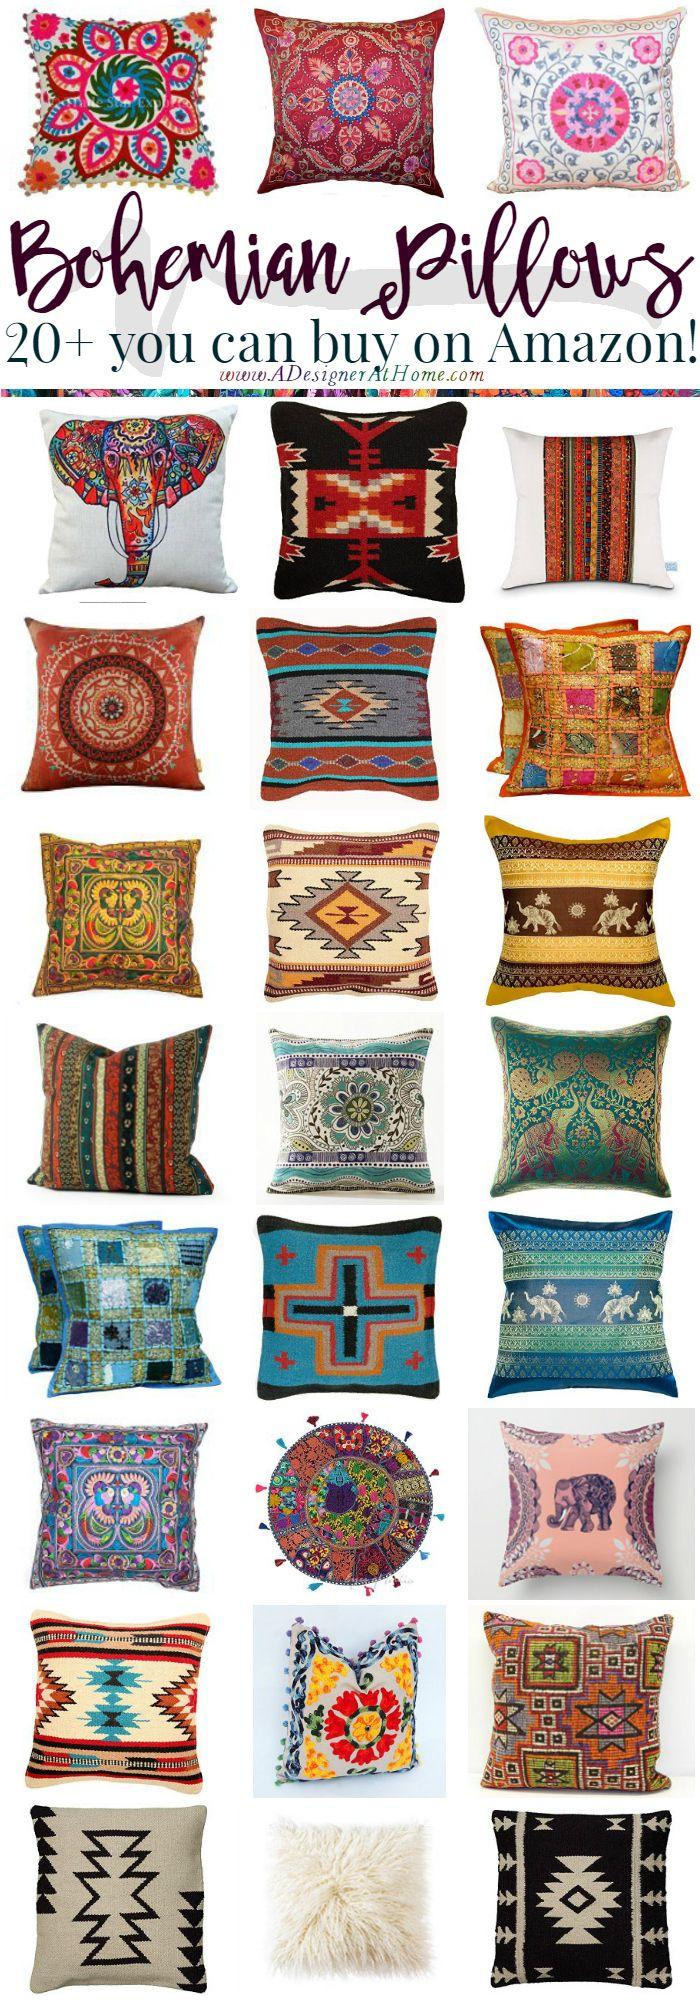 Where To Buy: Bohemian Pillows http://www.adesignerathome.com/where-to-buy-bohemian-pillows/